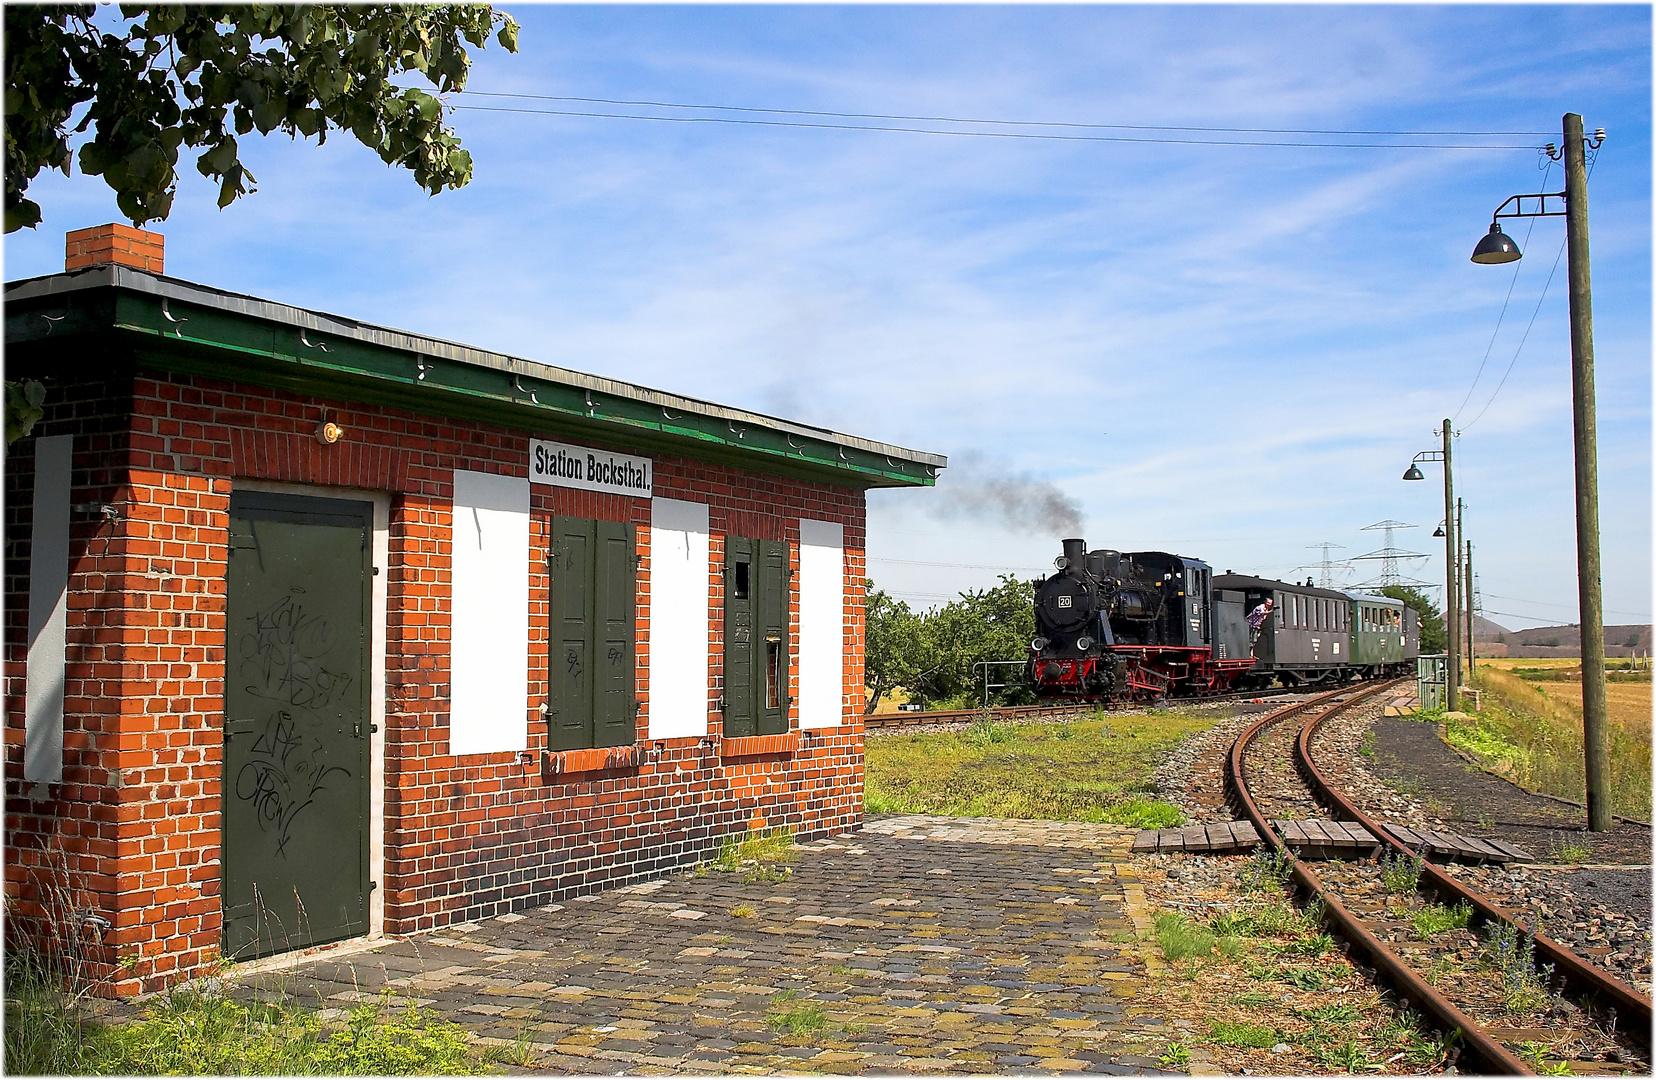 Station Bockstahal